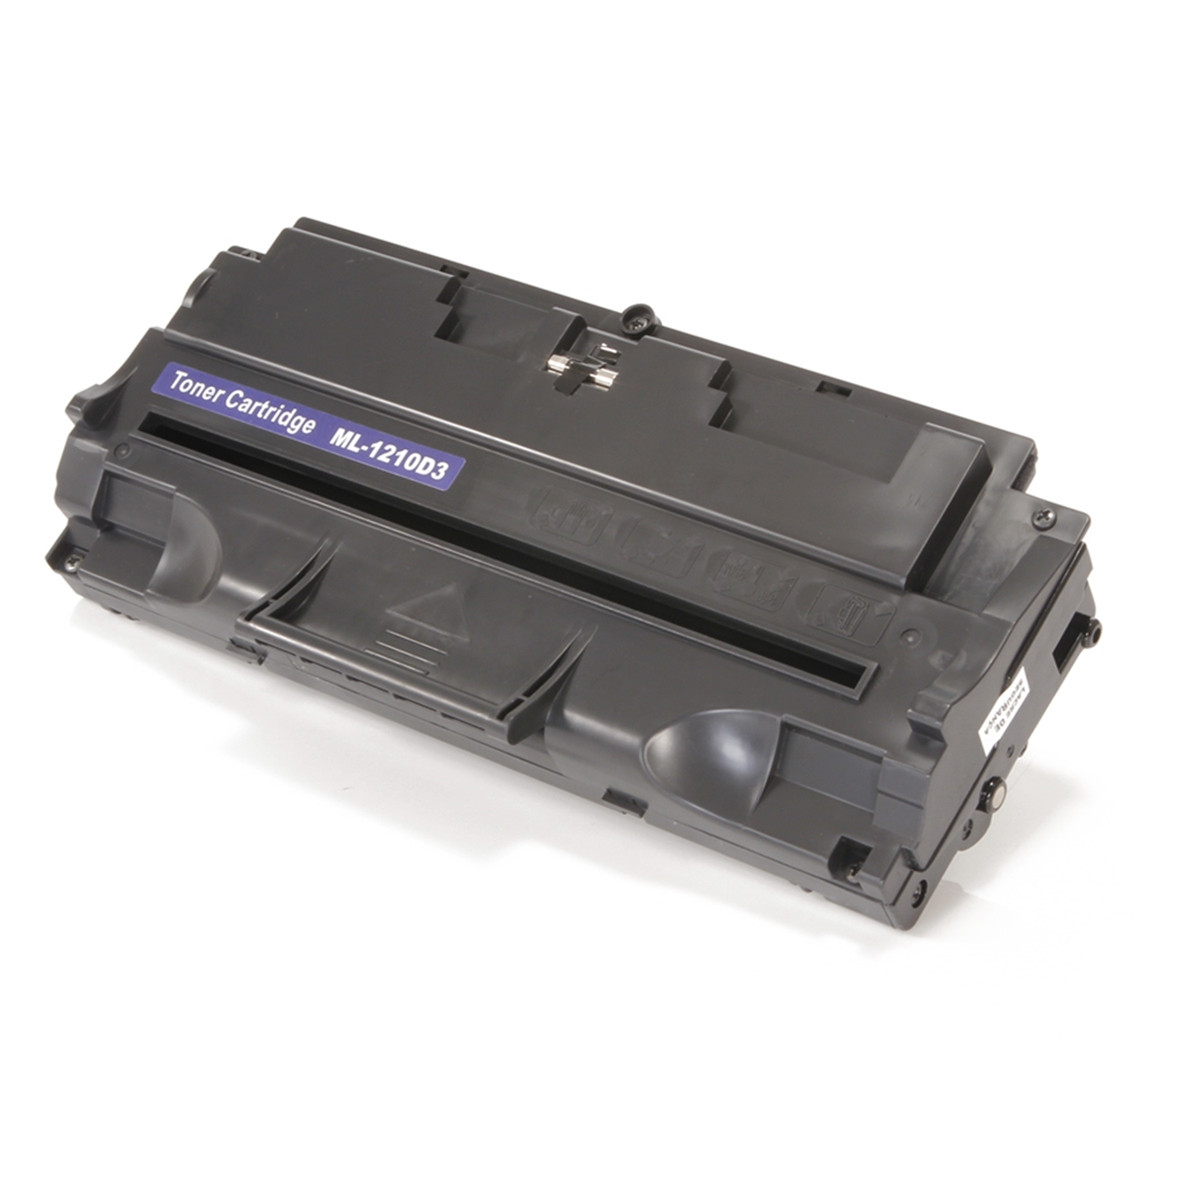 Toner Lexmark E210 E212 | 10S0150 | Premium Quality 3k